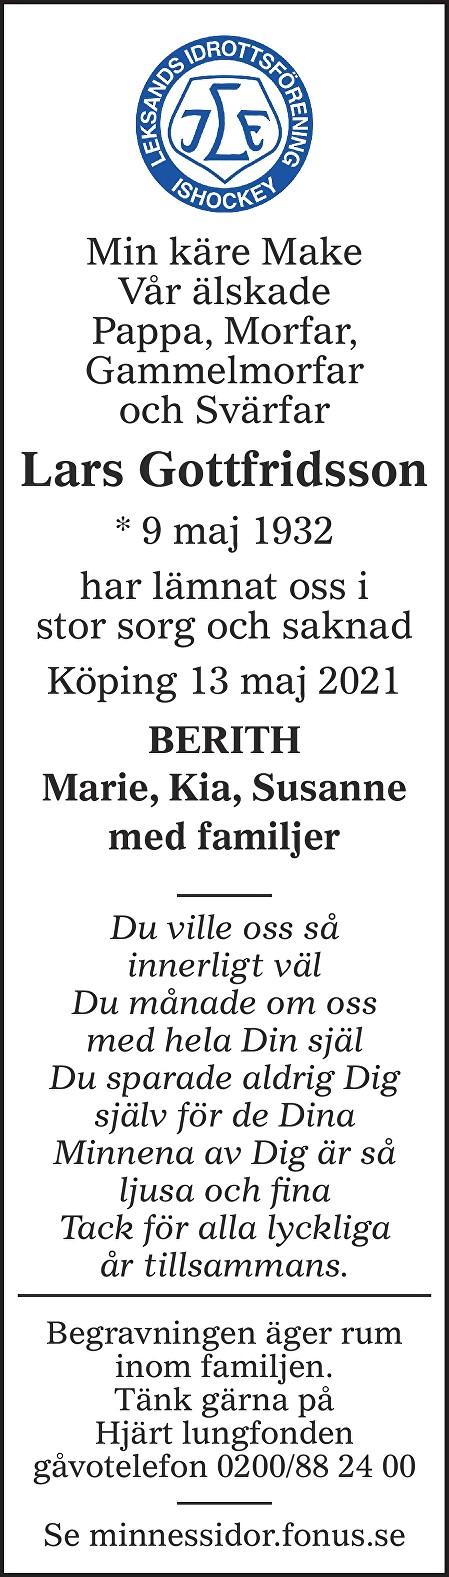 Lars Gottfridsson Death notice